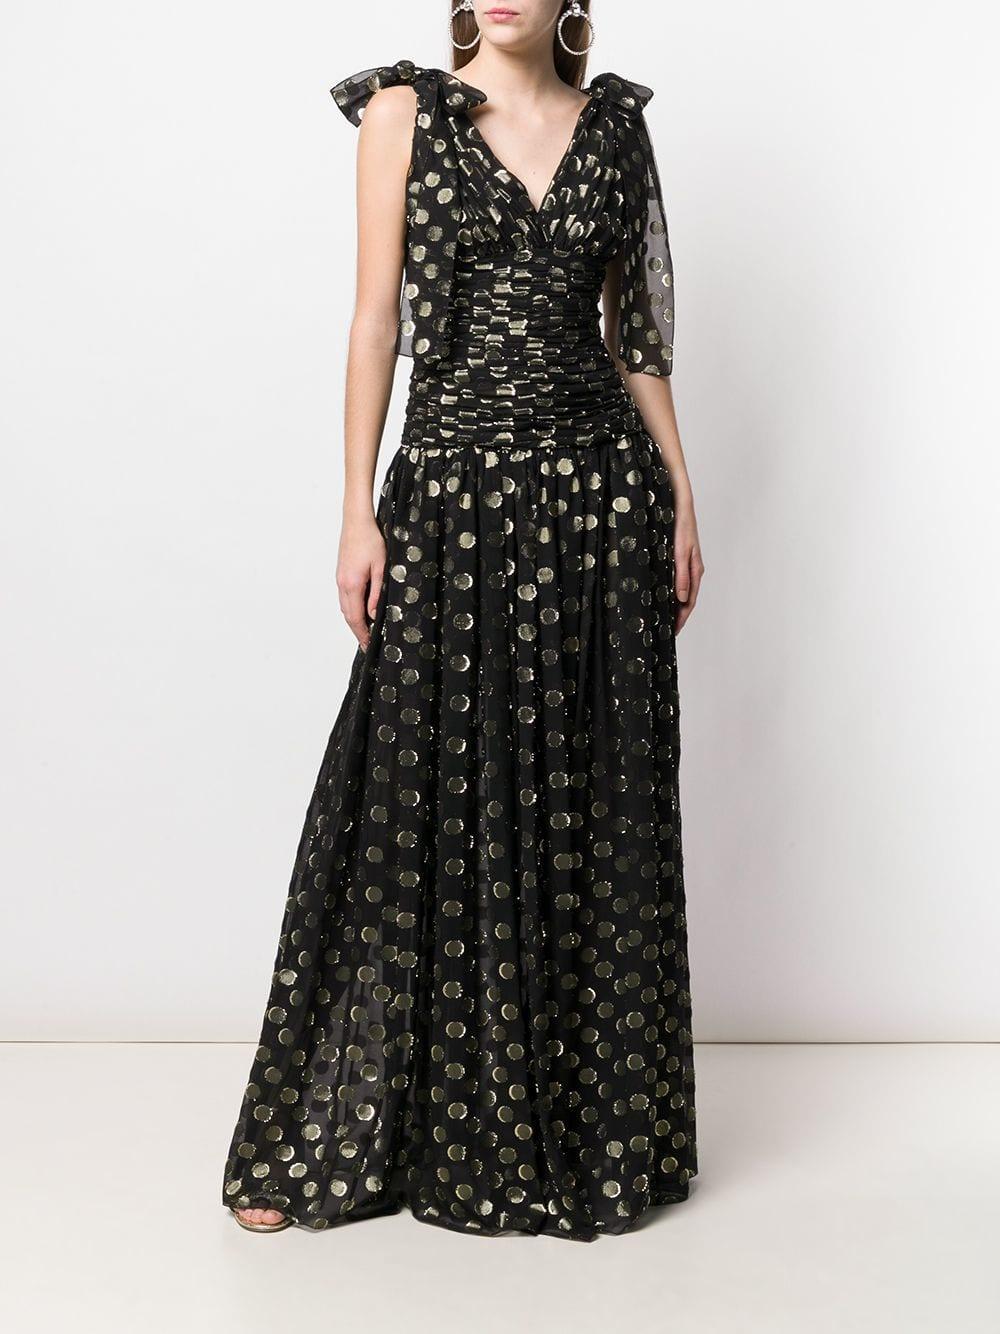 a4404dcc Lyst - Dolce & Gabbana Metallic Spot Print Evening Dress in Black - Save 21%